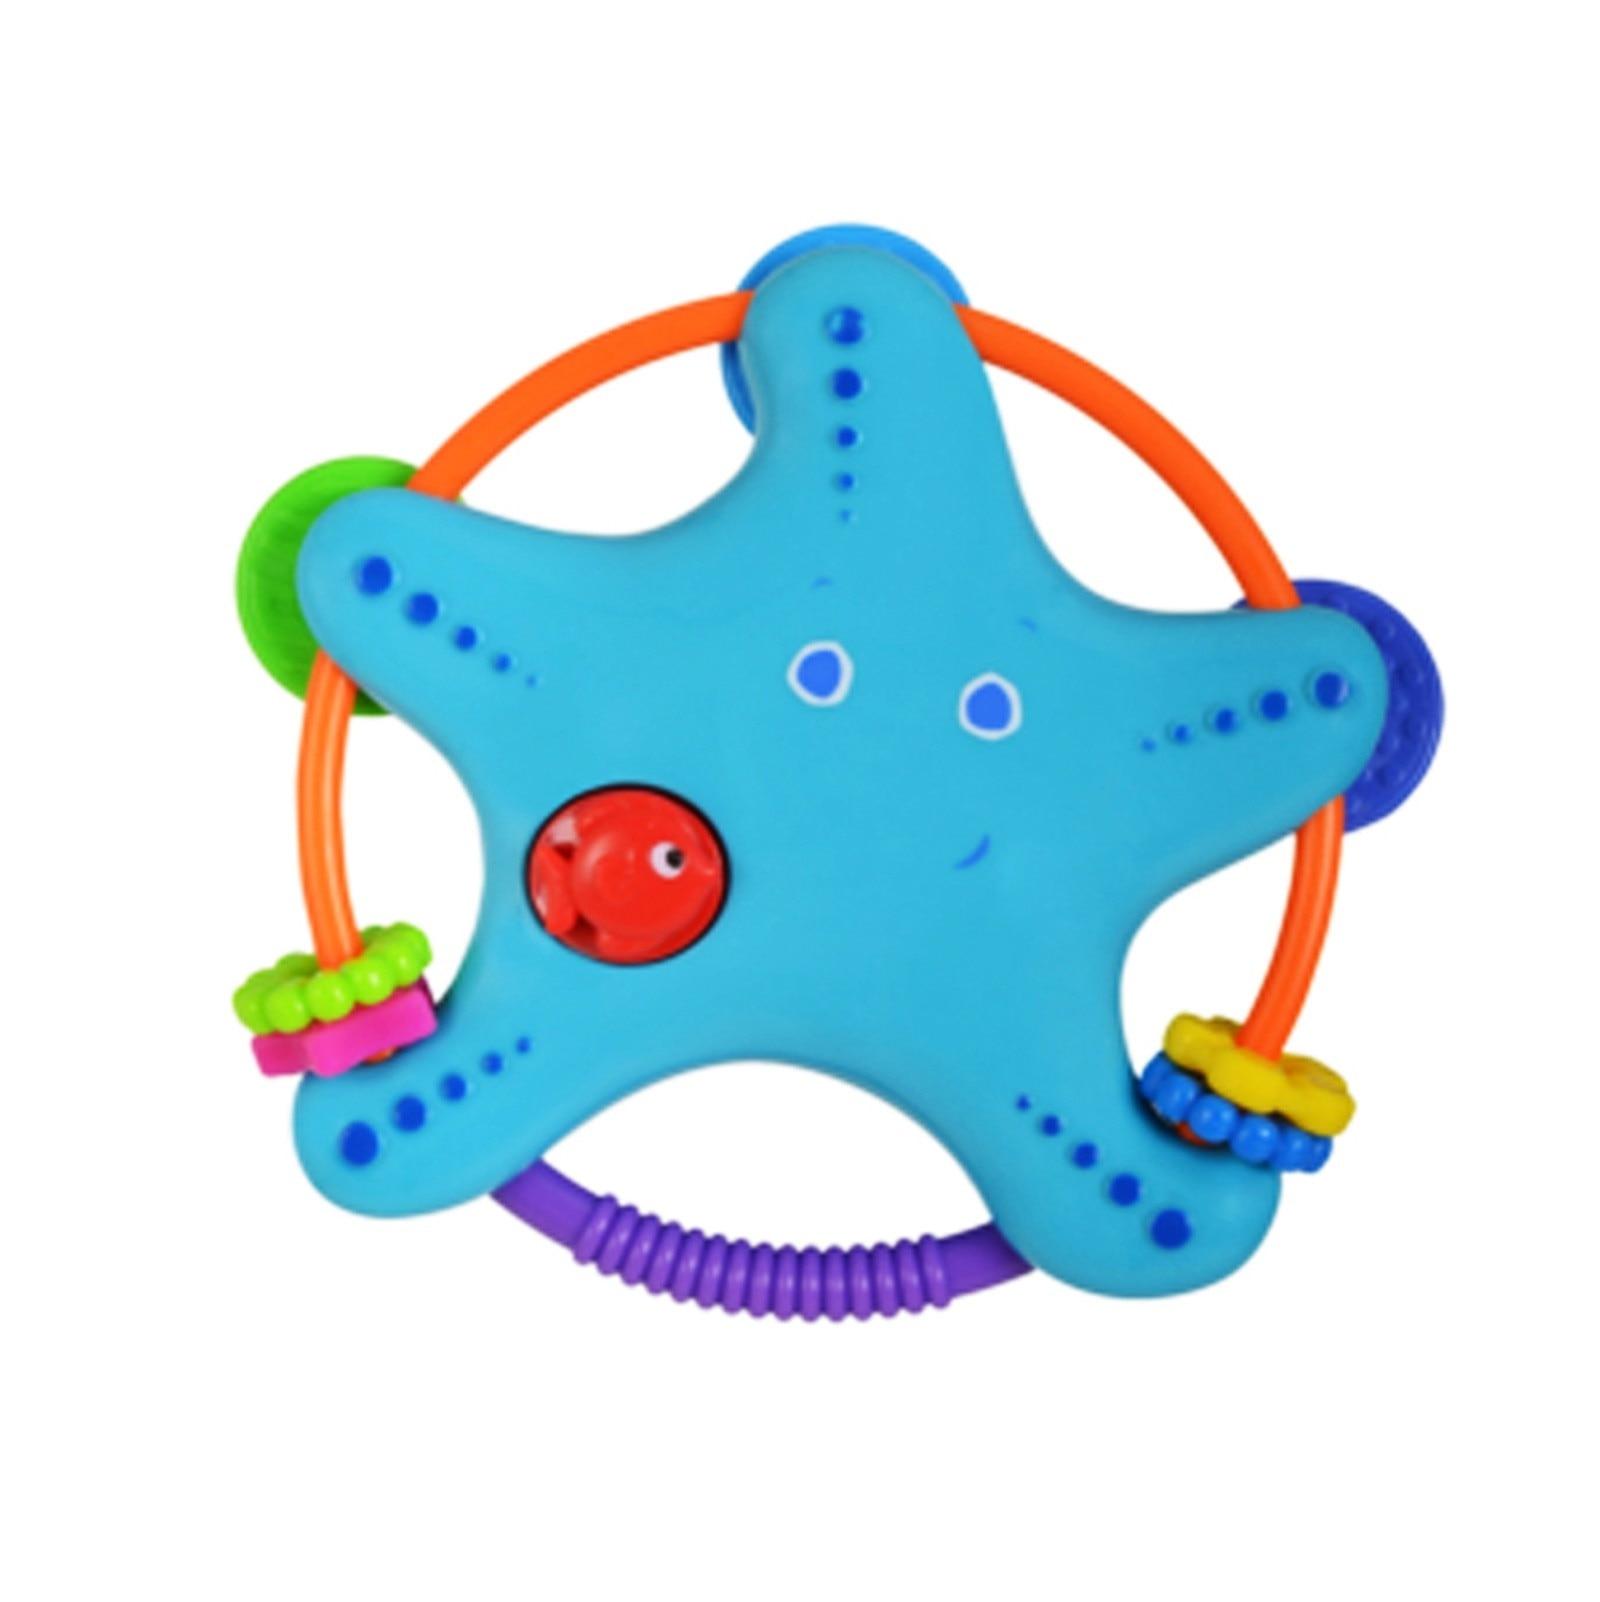 Ebebek Bondigo Baby Mirror Rattle Toy